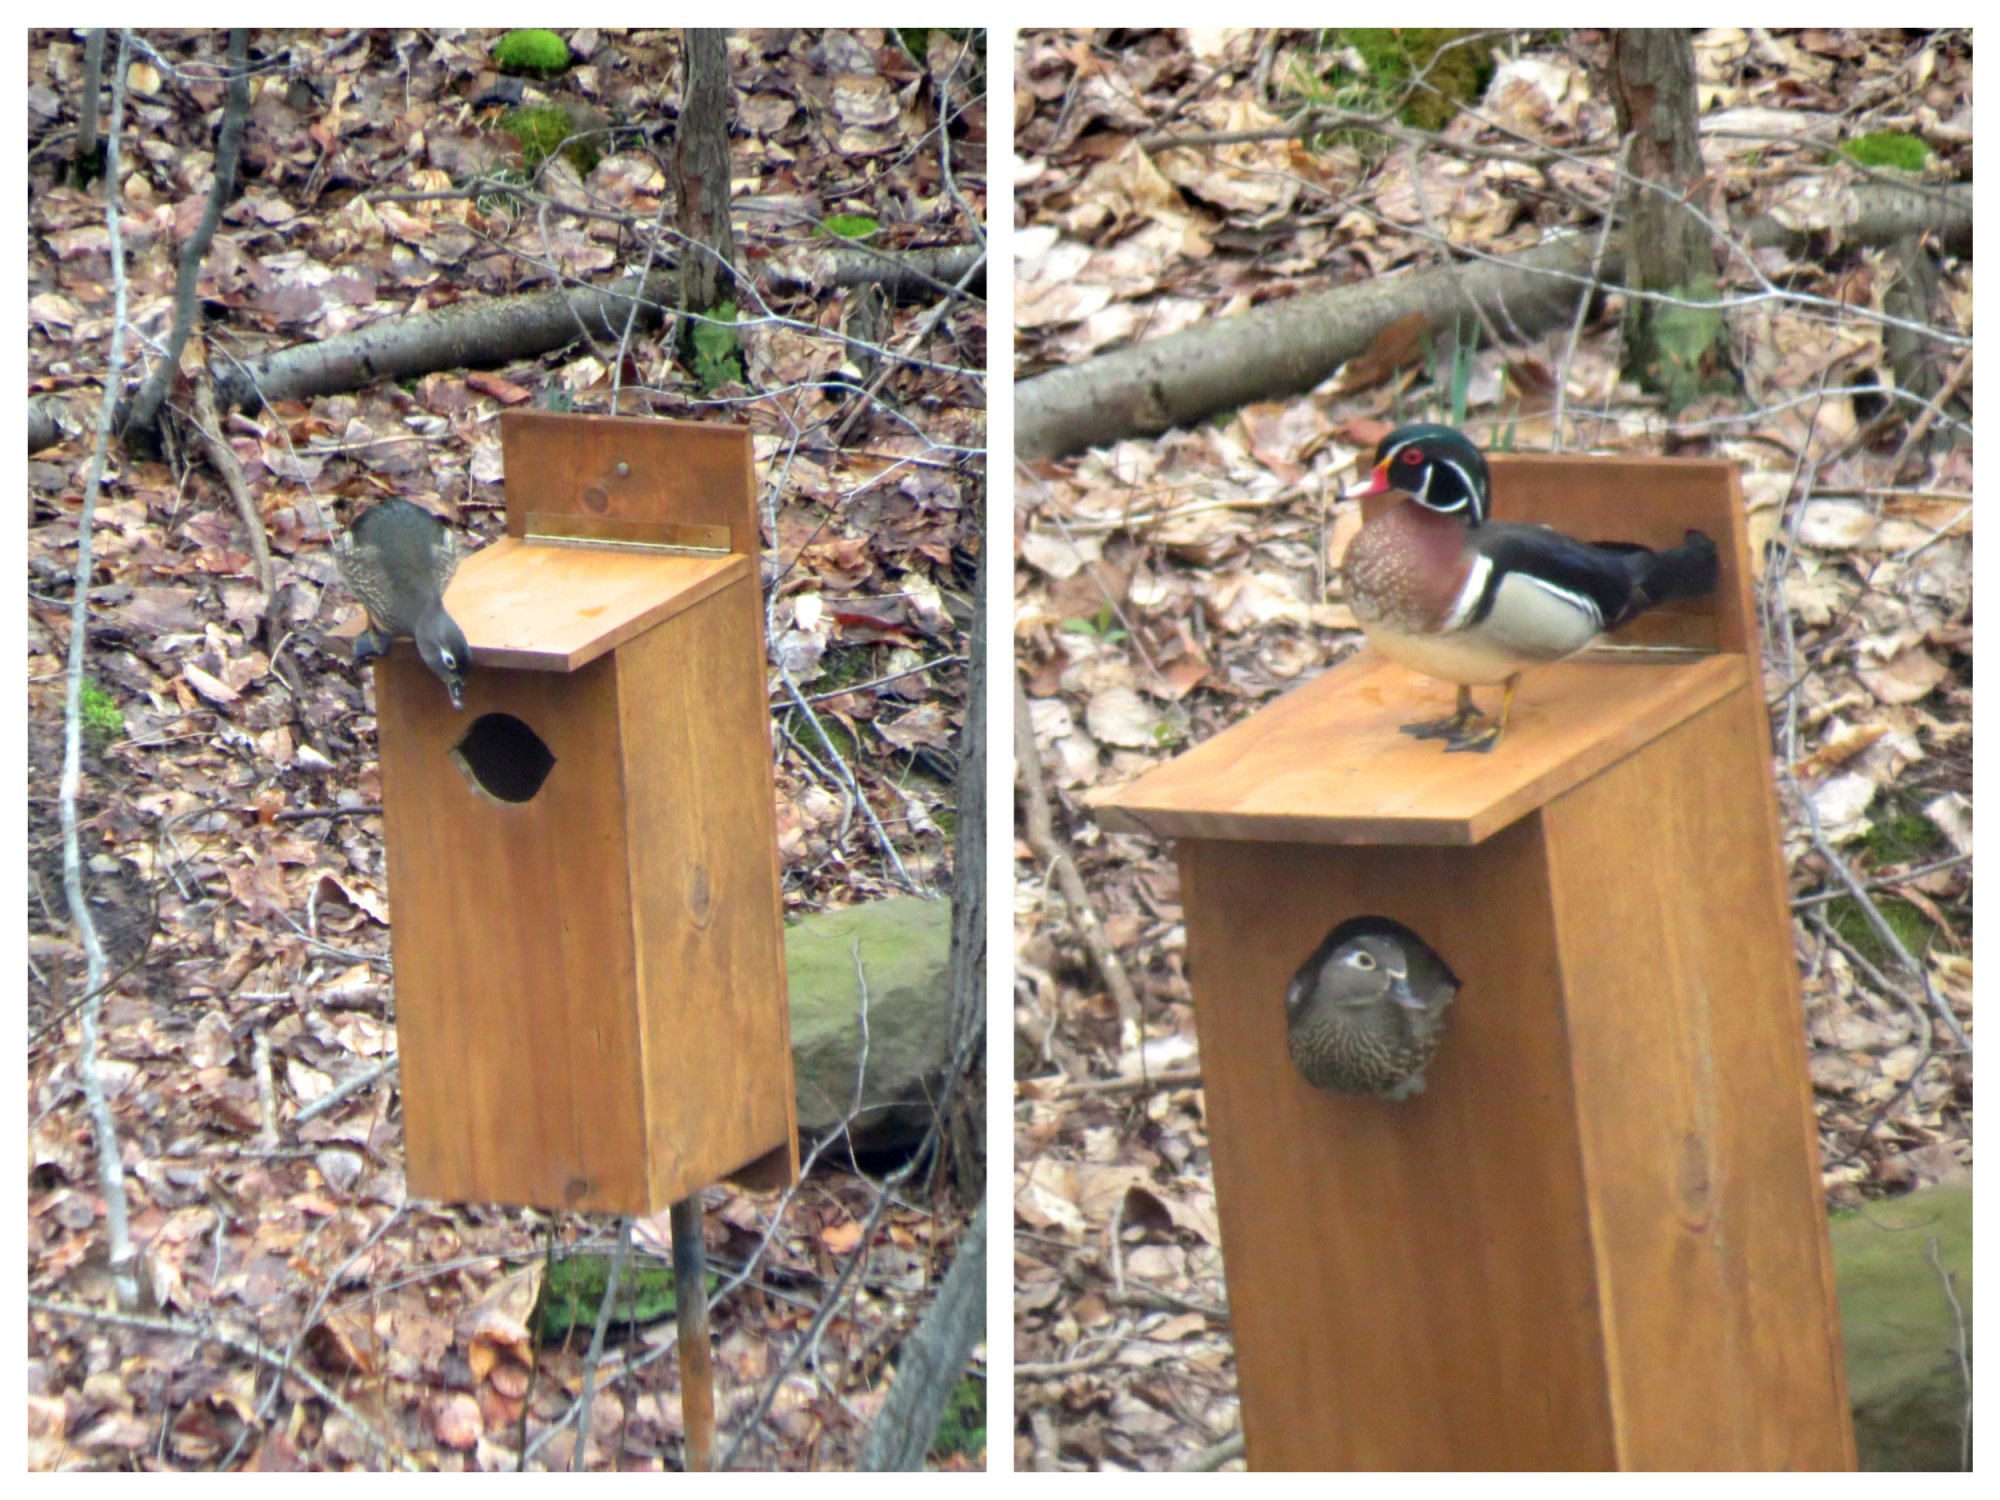 Wood duck nesting box brings a variety of avian visitors wildlife nesting pair of wood ducks publicscrutiny Choice Image